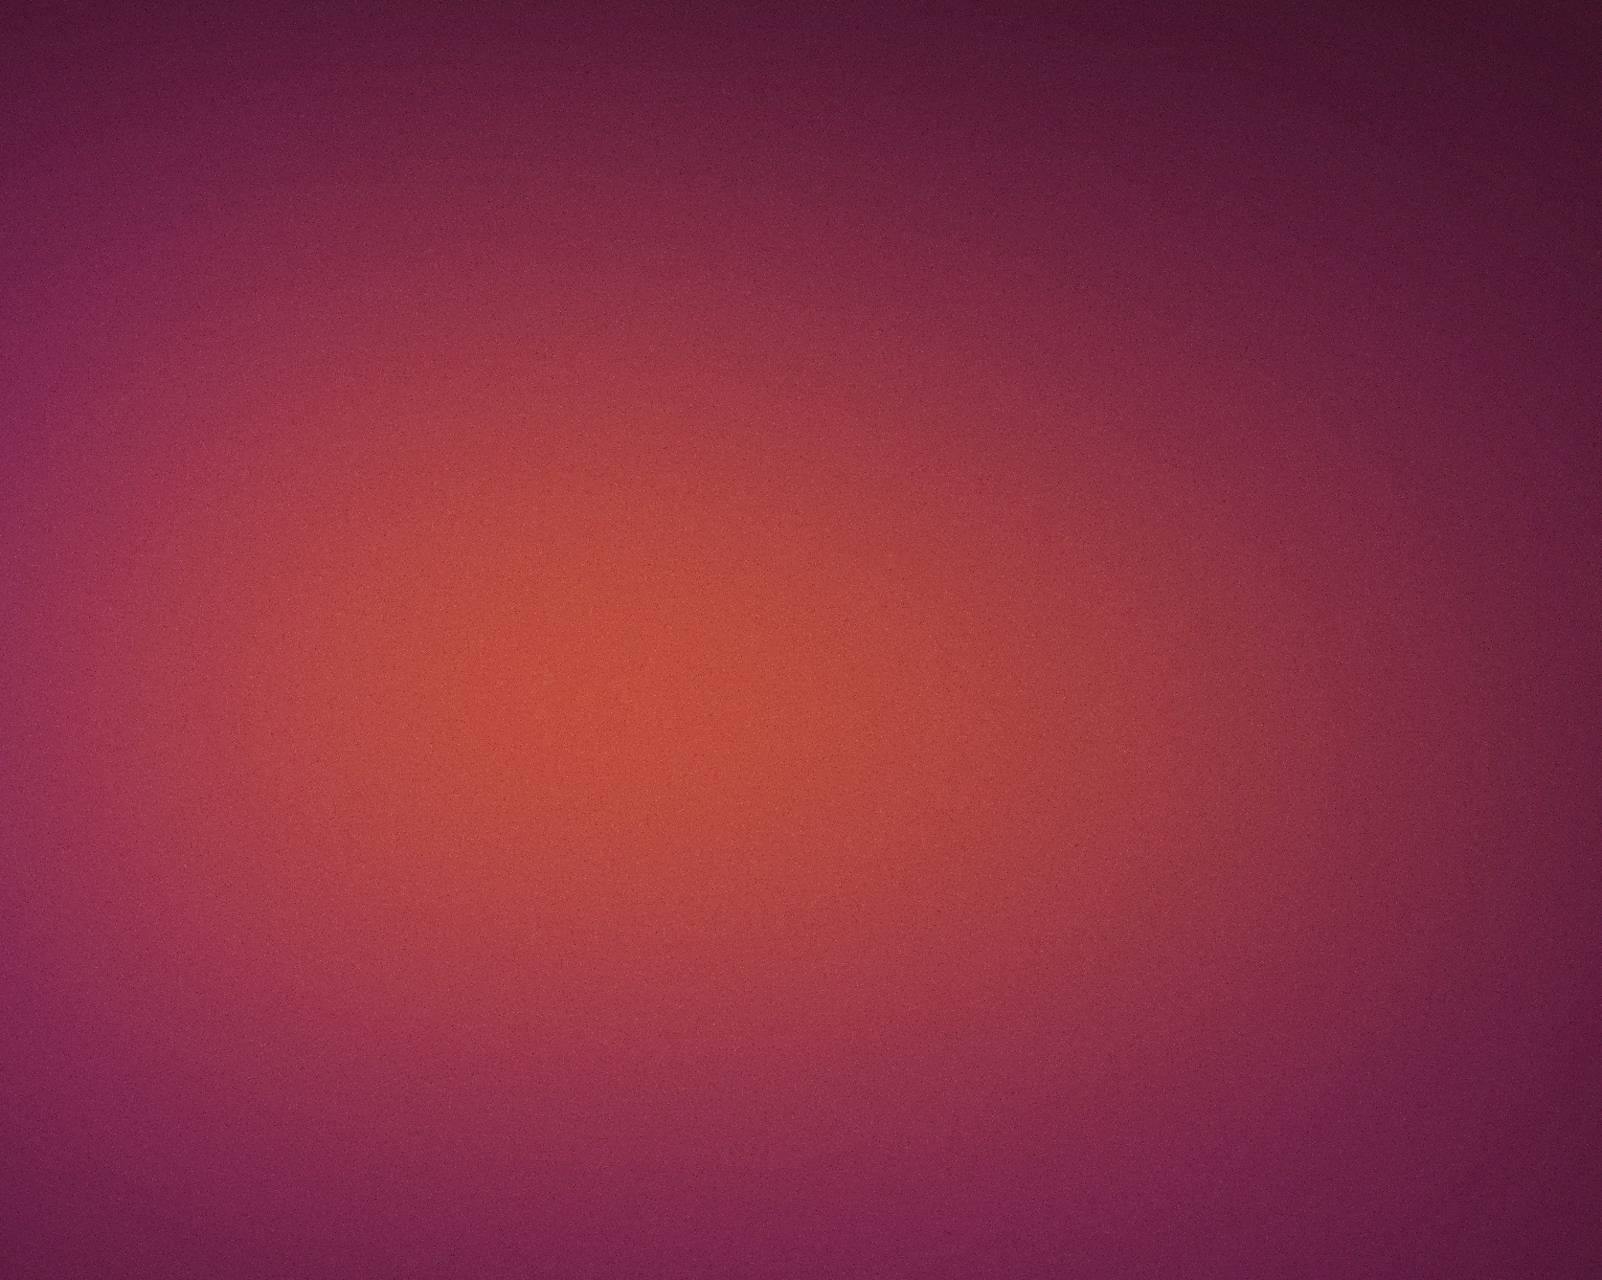 Ubuntu Concept